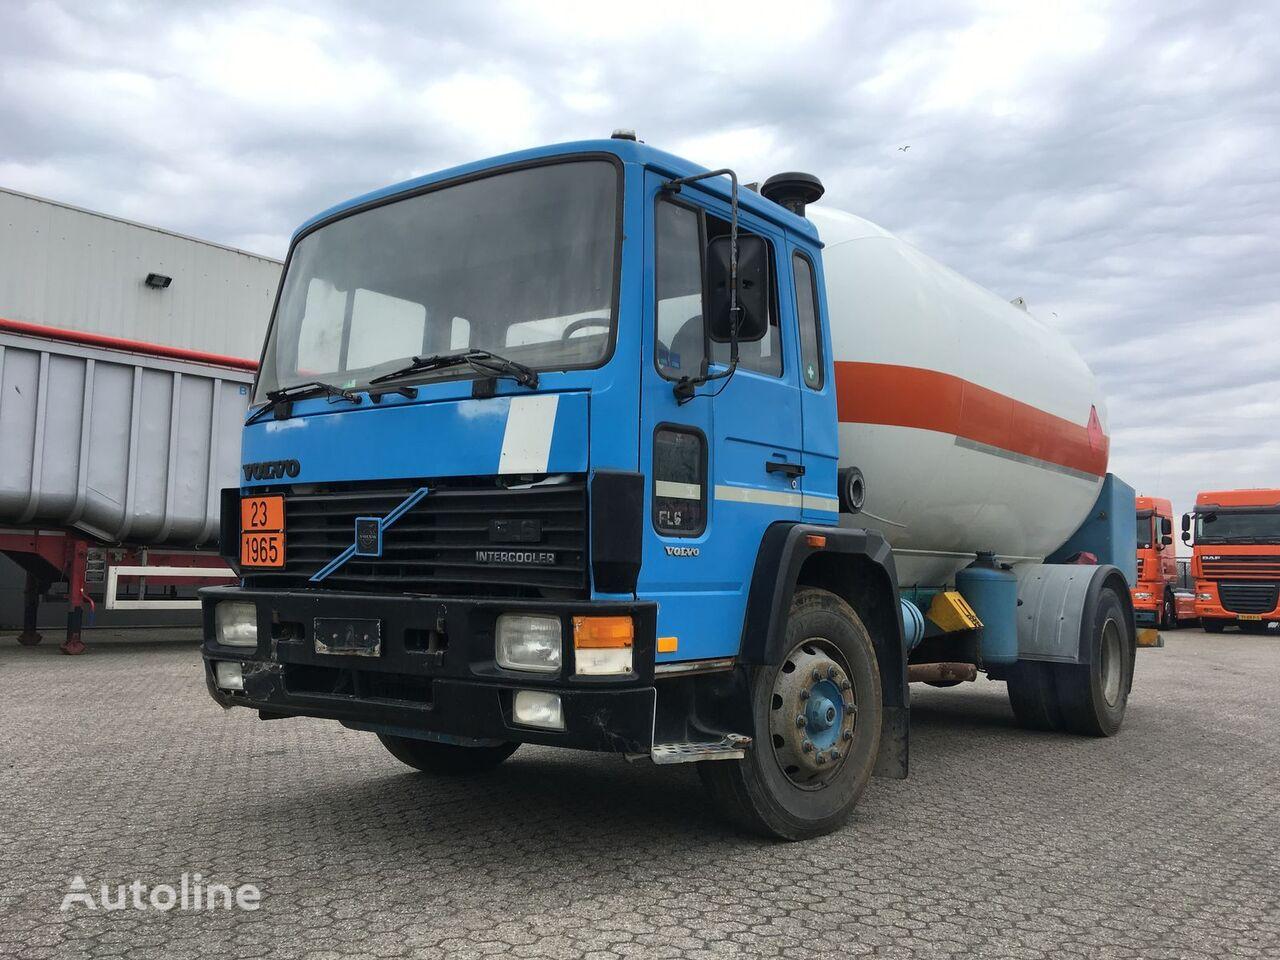 VOLVO Volvo Gas - Gaz - ADR 2 - 16.000ltr - 25Bar - P25BH gas tank truck